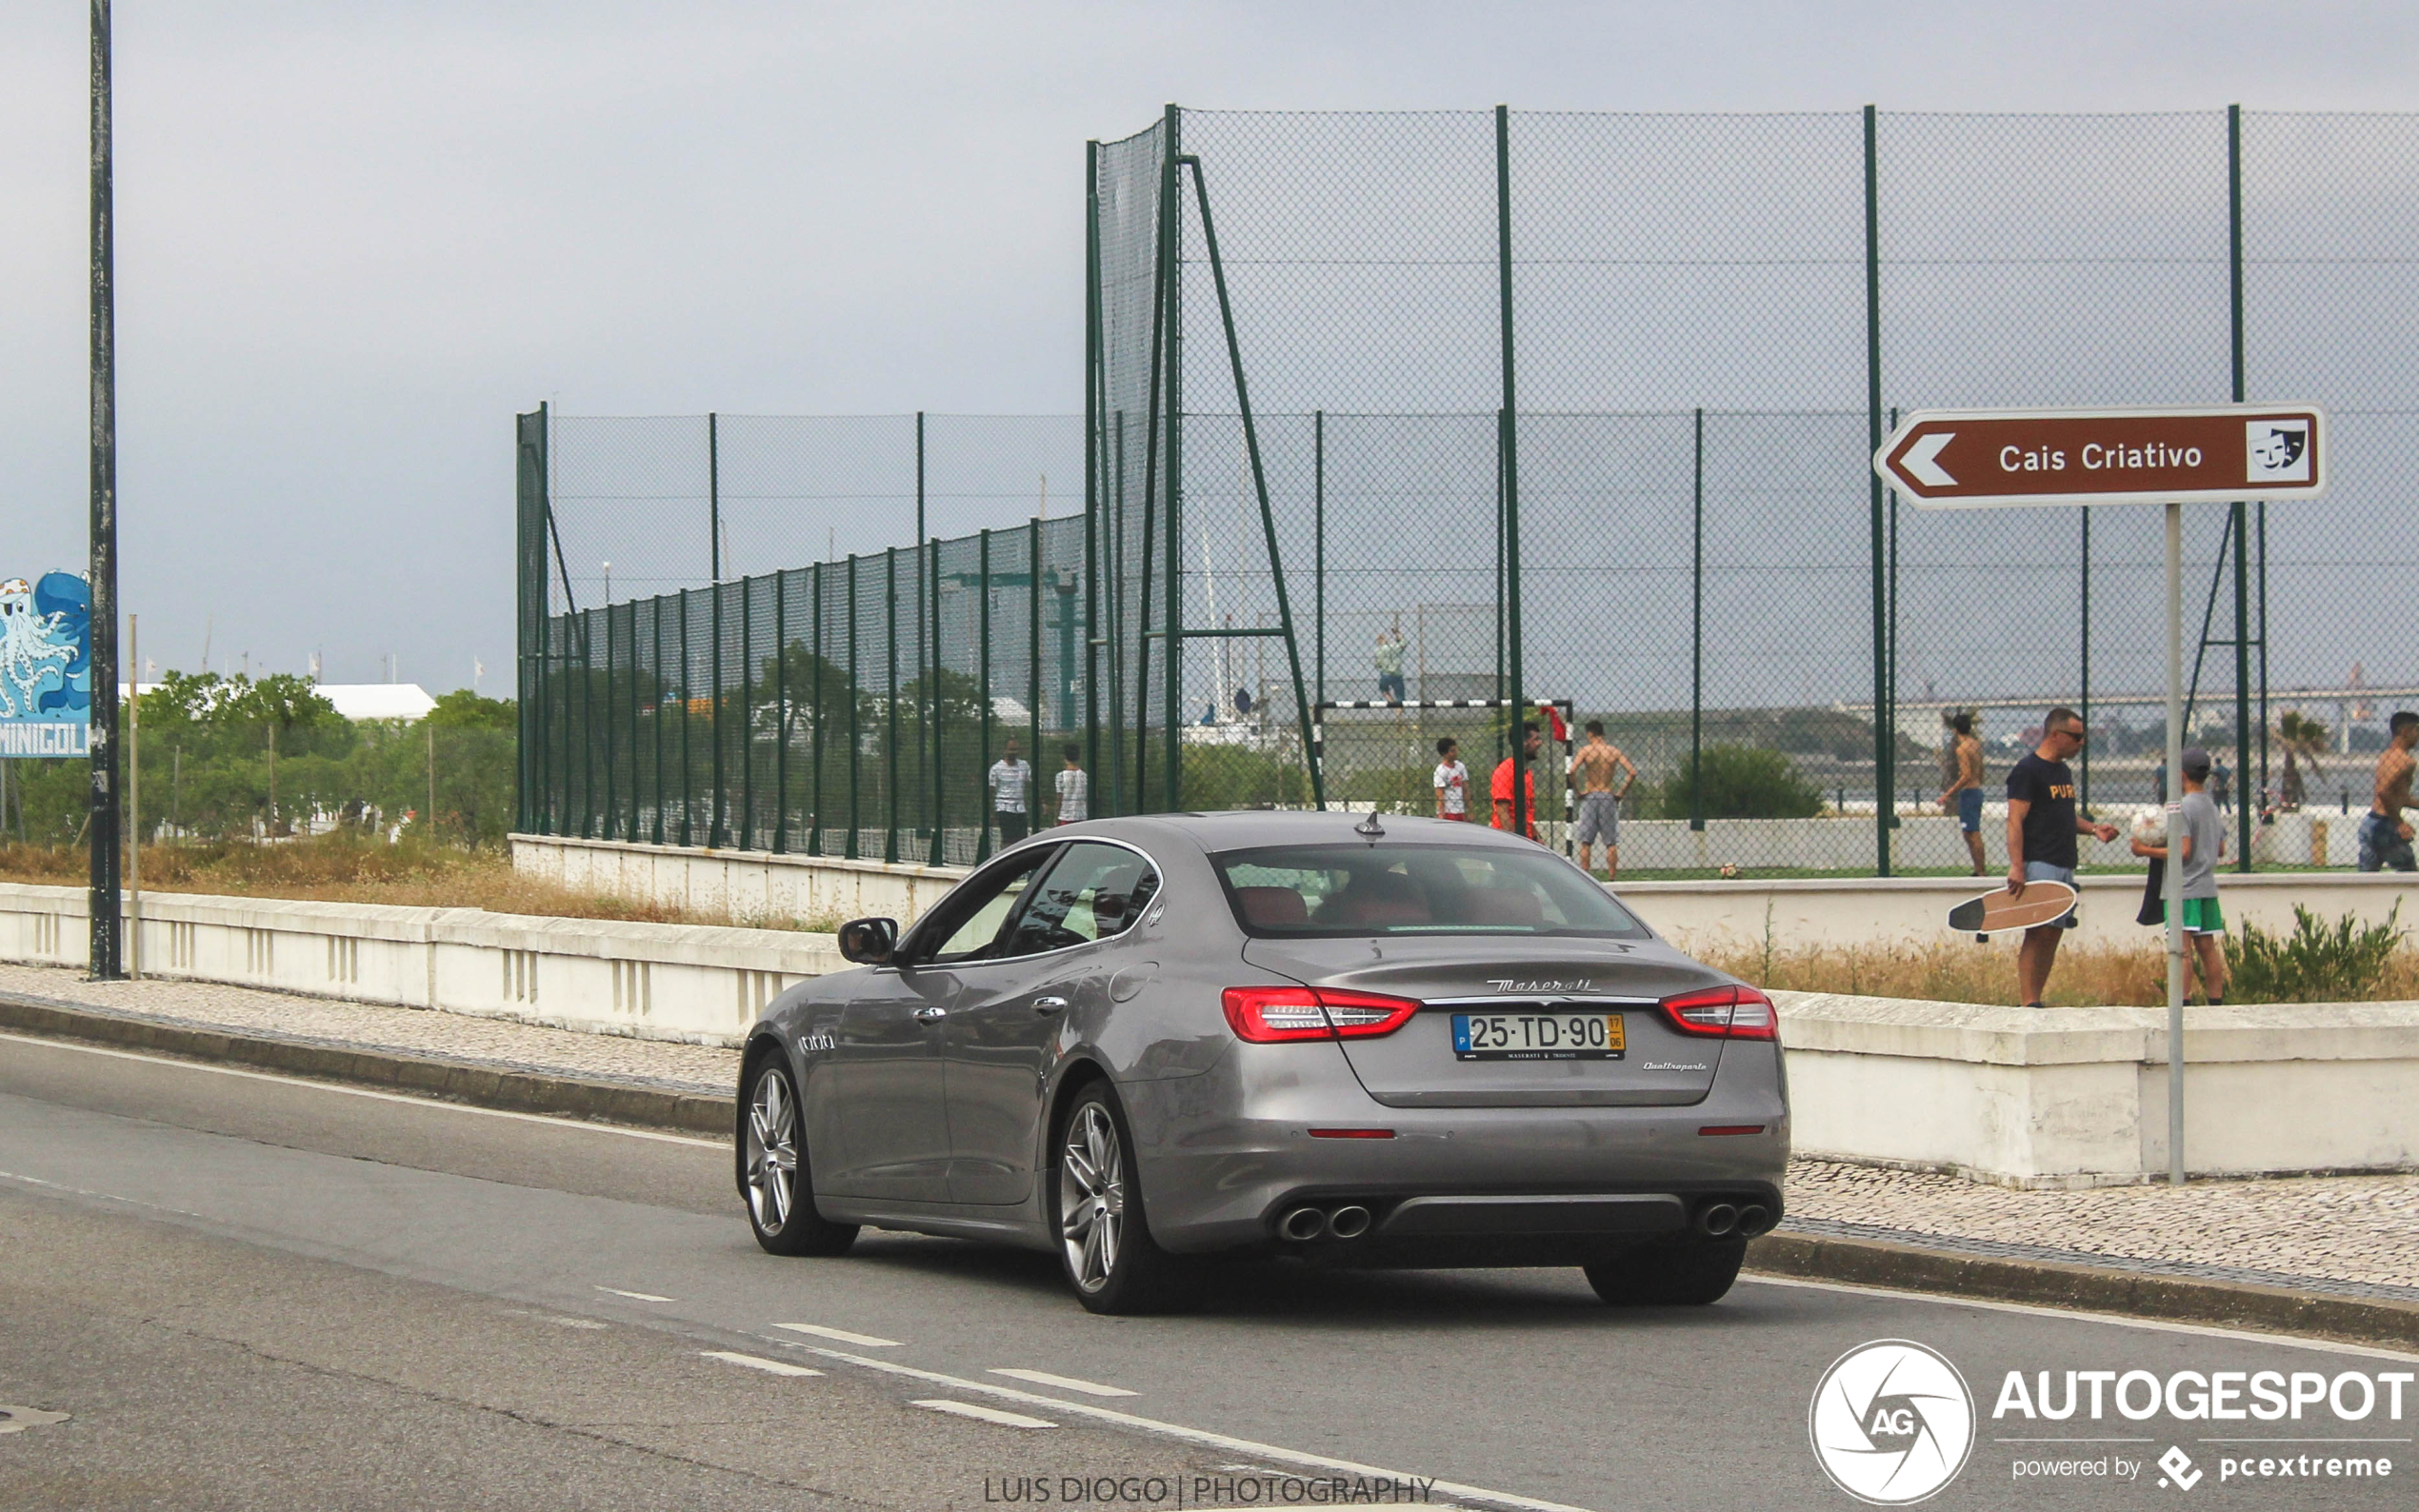 Maserati Quattroporte Diesel GranLusso - 24 juni 2020 - Autogespot